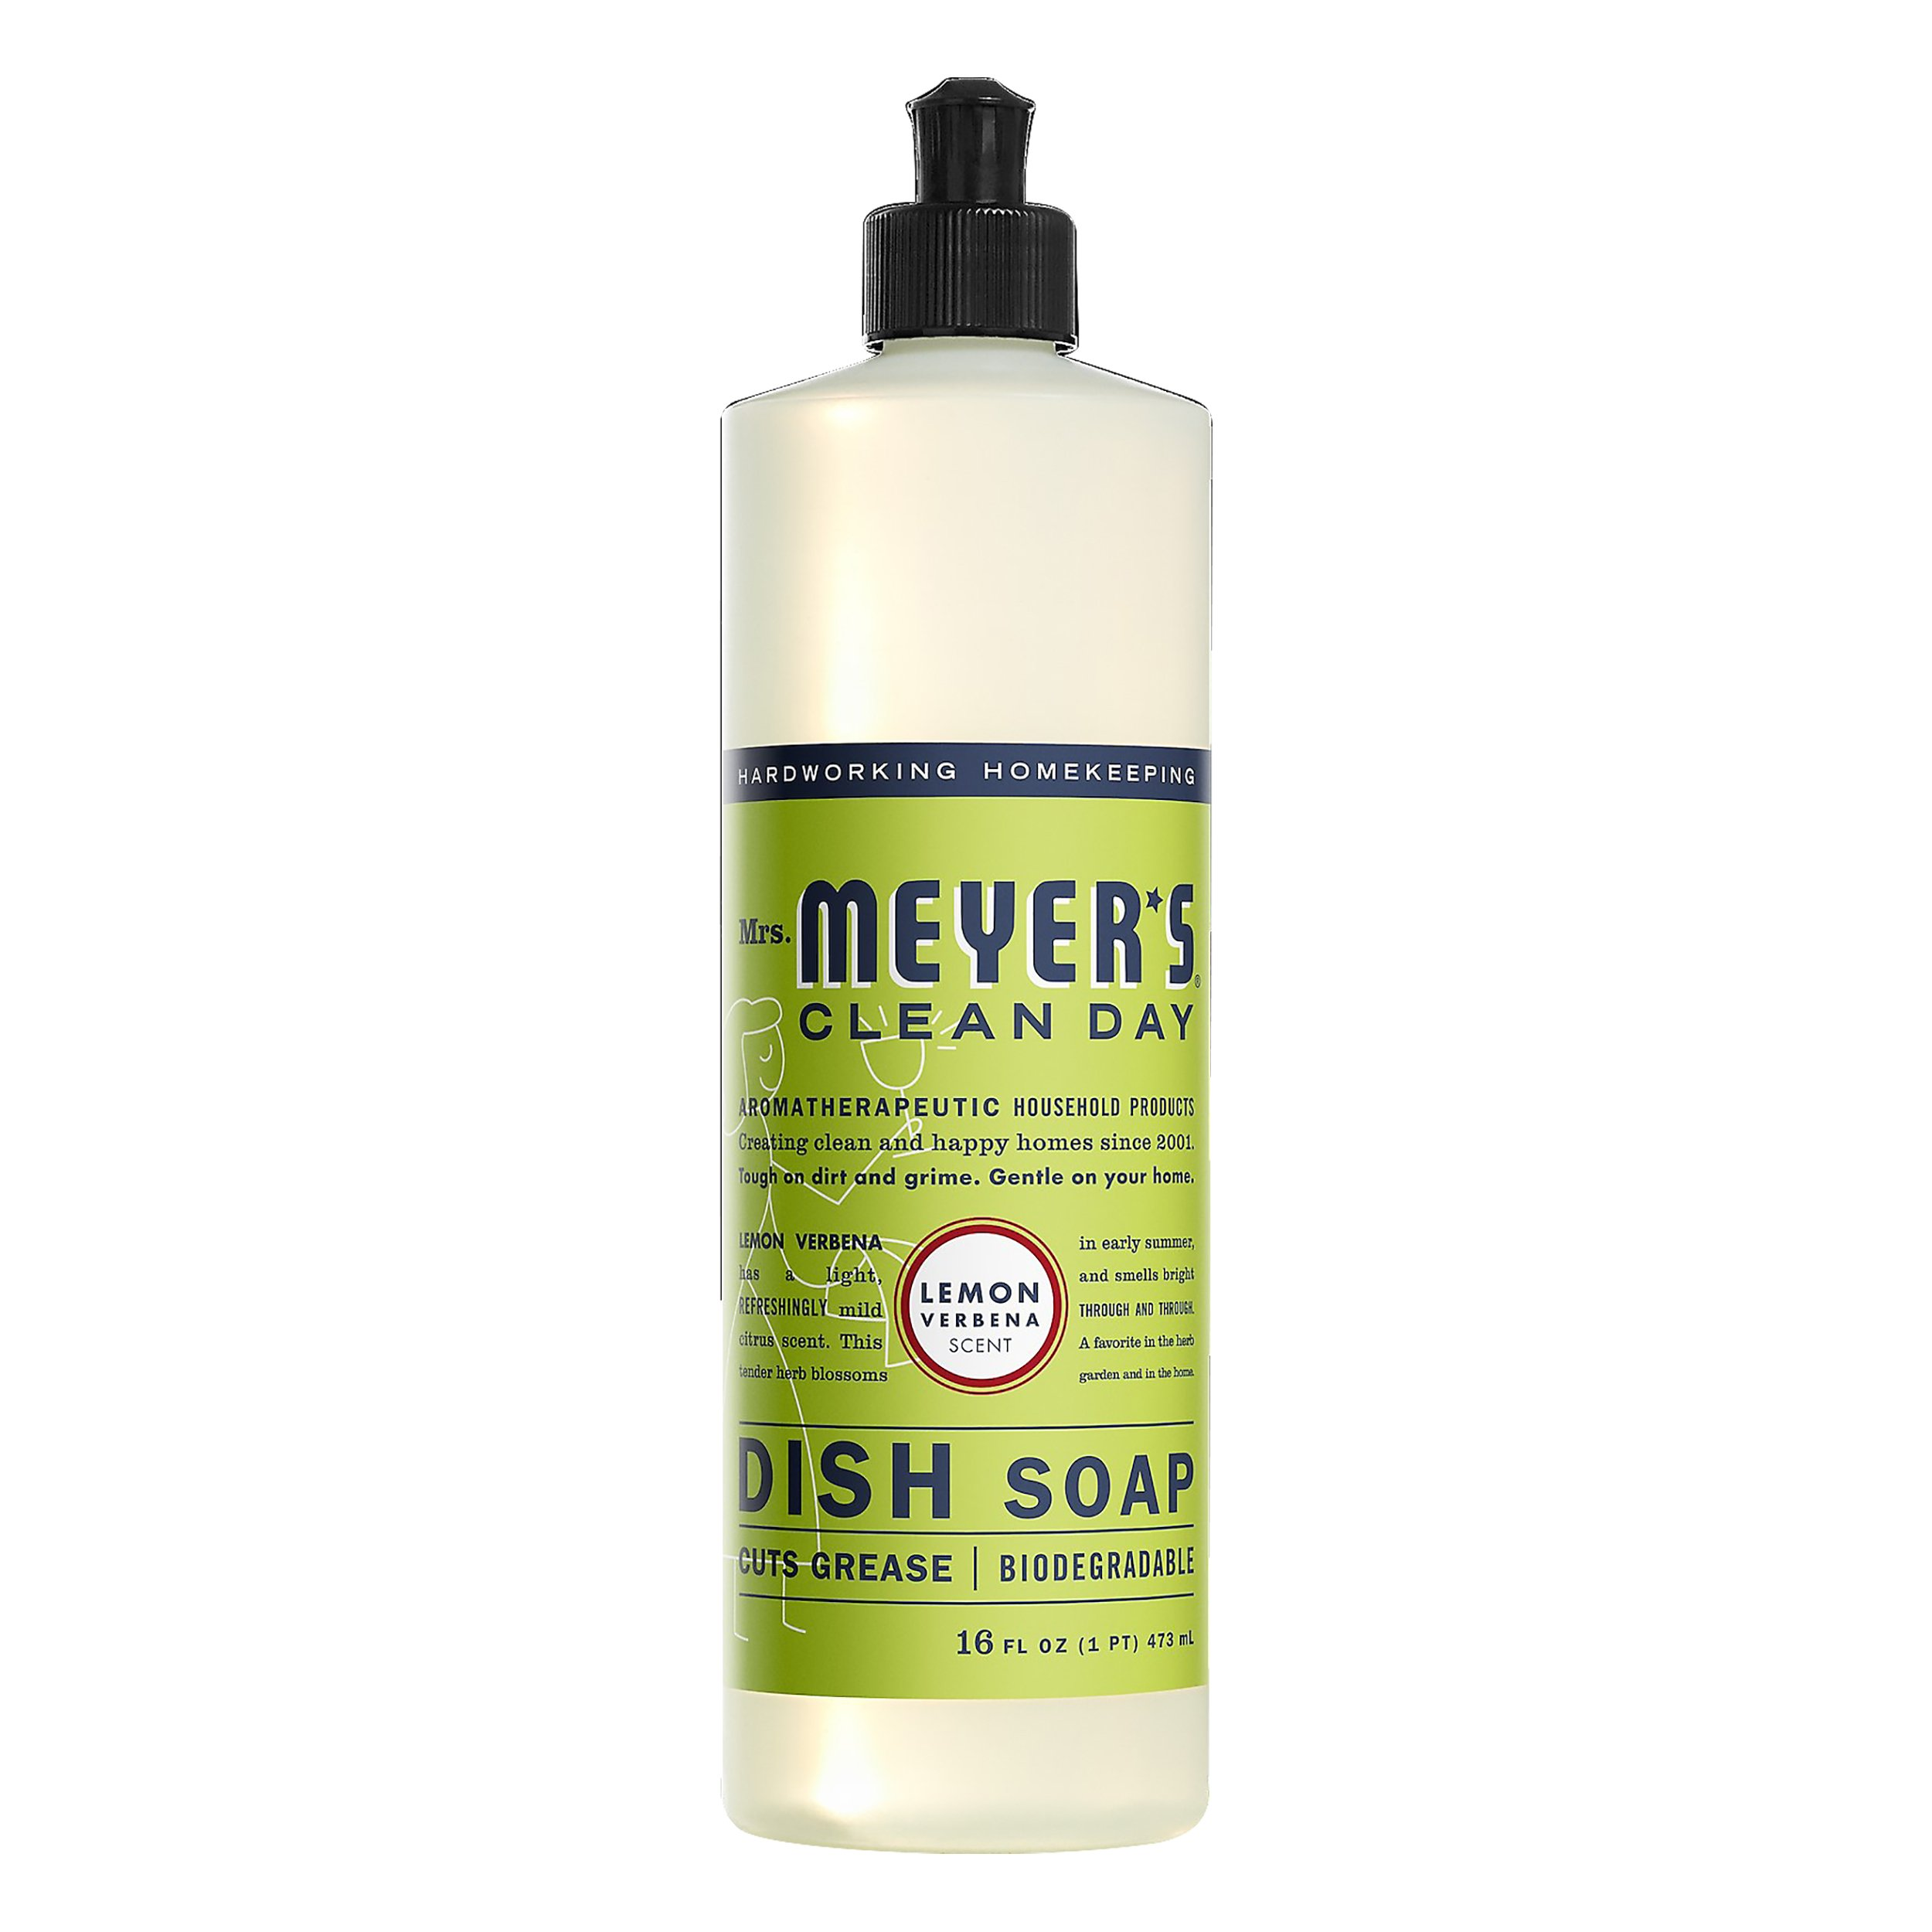 Mrs. Meyers Clean Day Lemon Verbana 16OZ 6-Pack